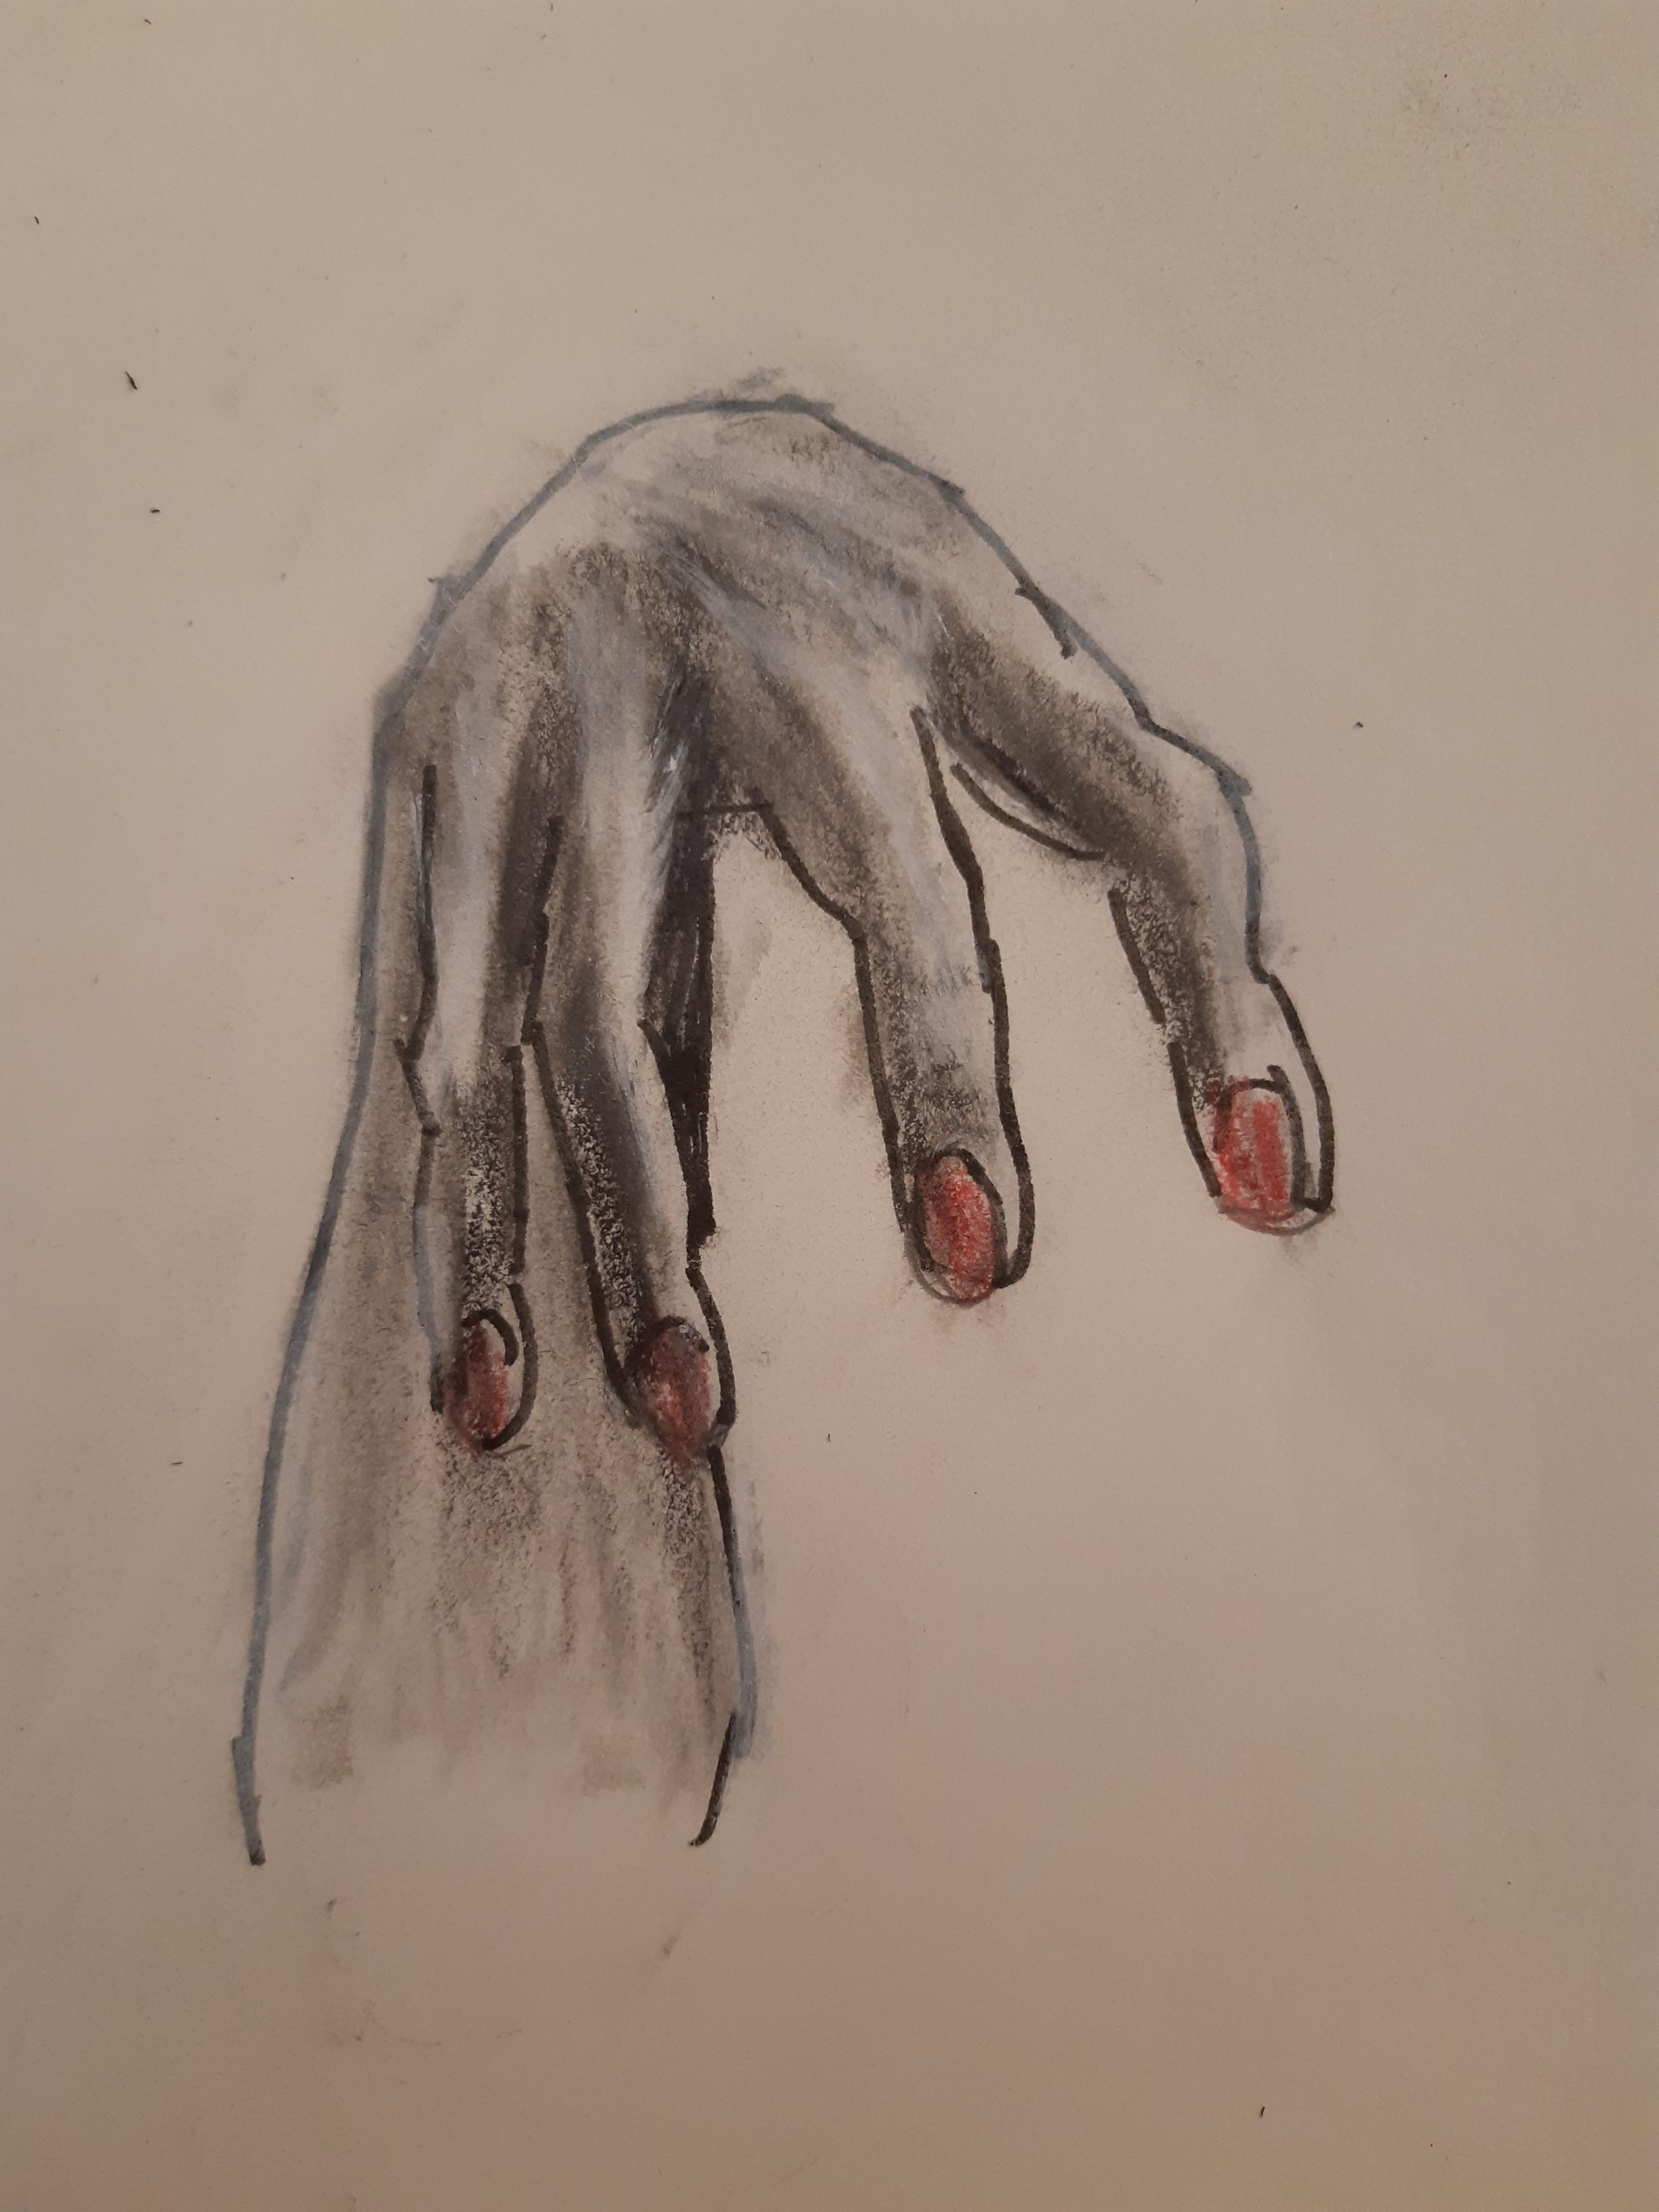 �tude dessin doit ongles  cours de dessin